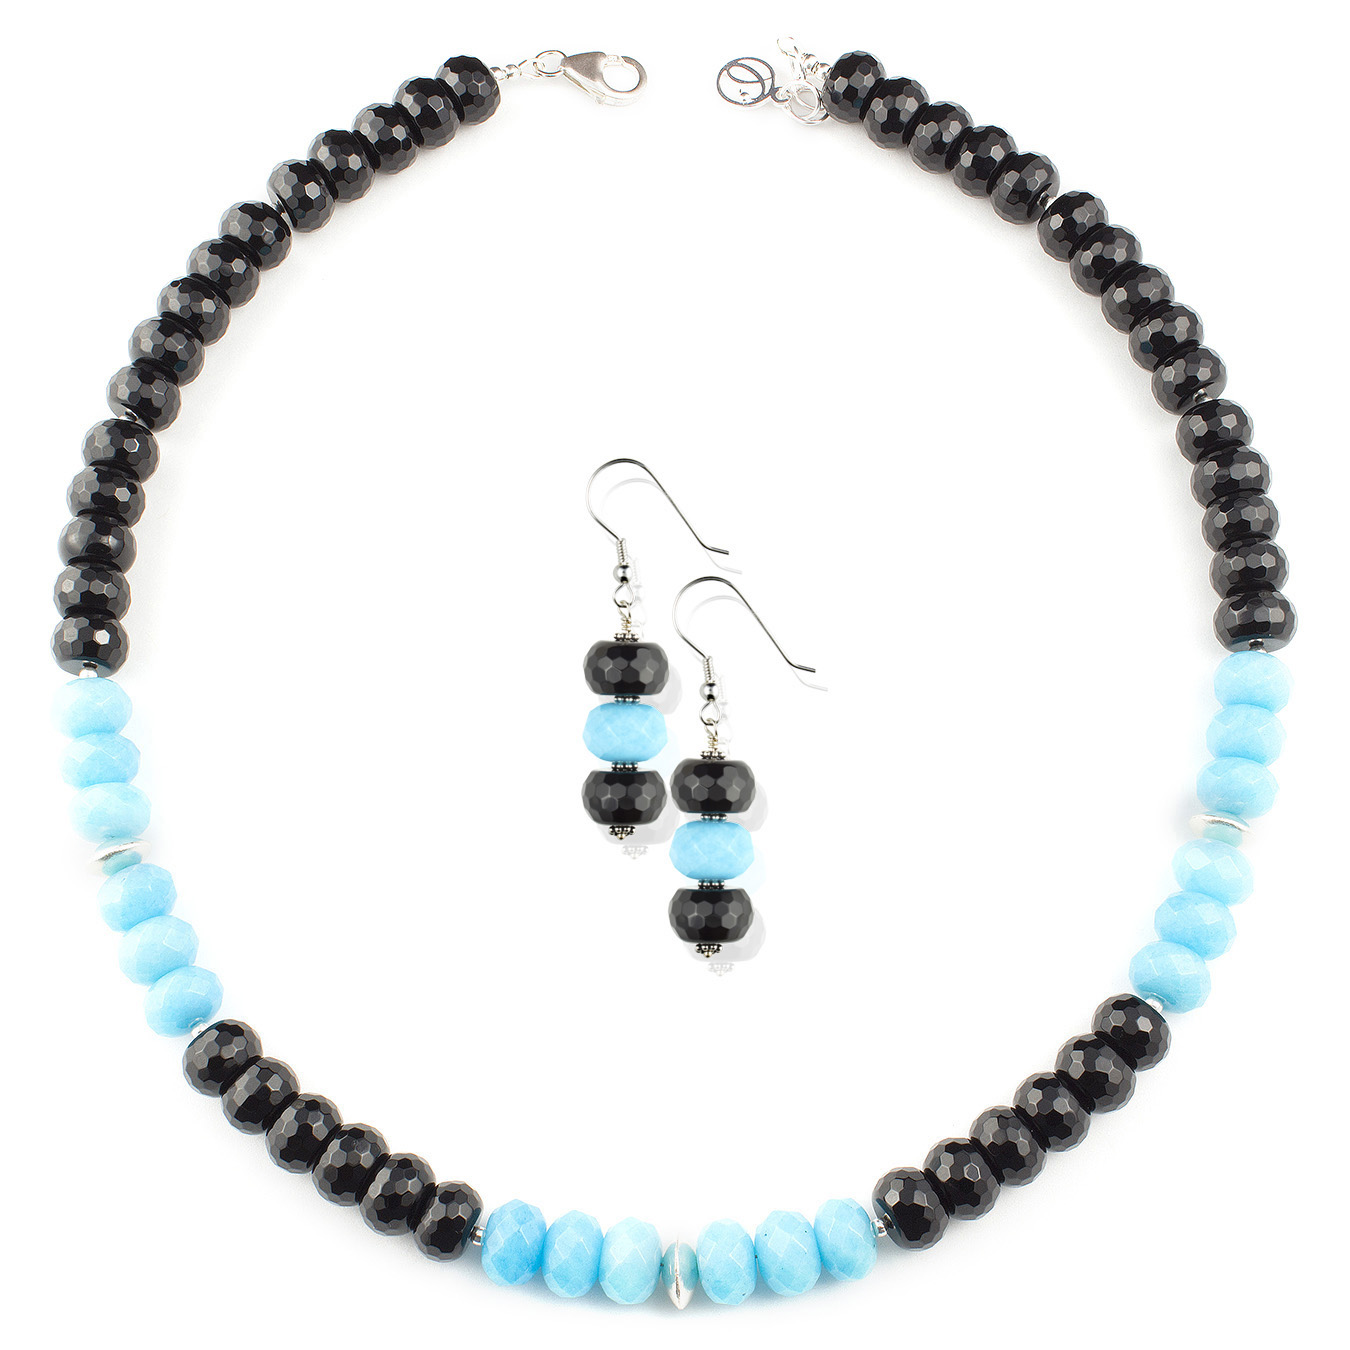 Personalized artisan Thai silver choker necklace using jade gemstones